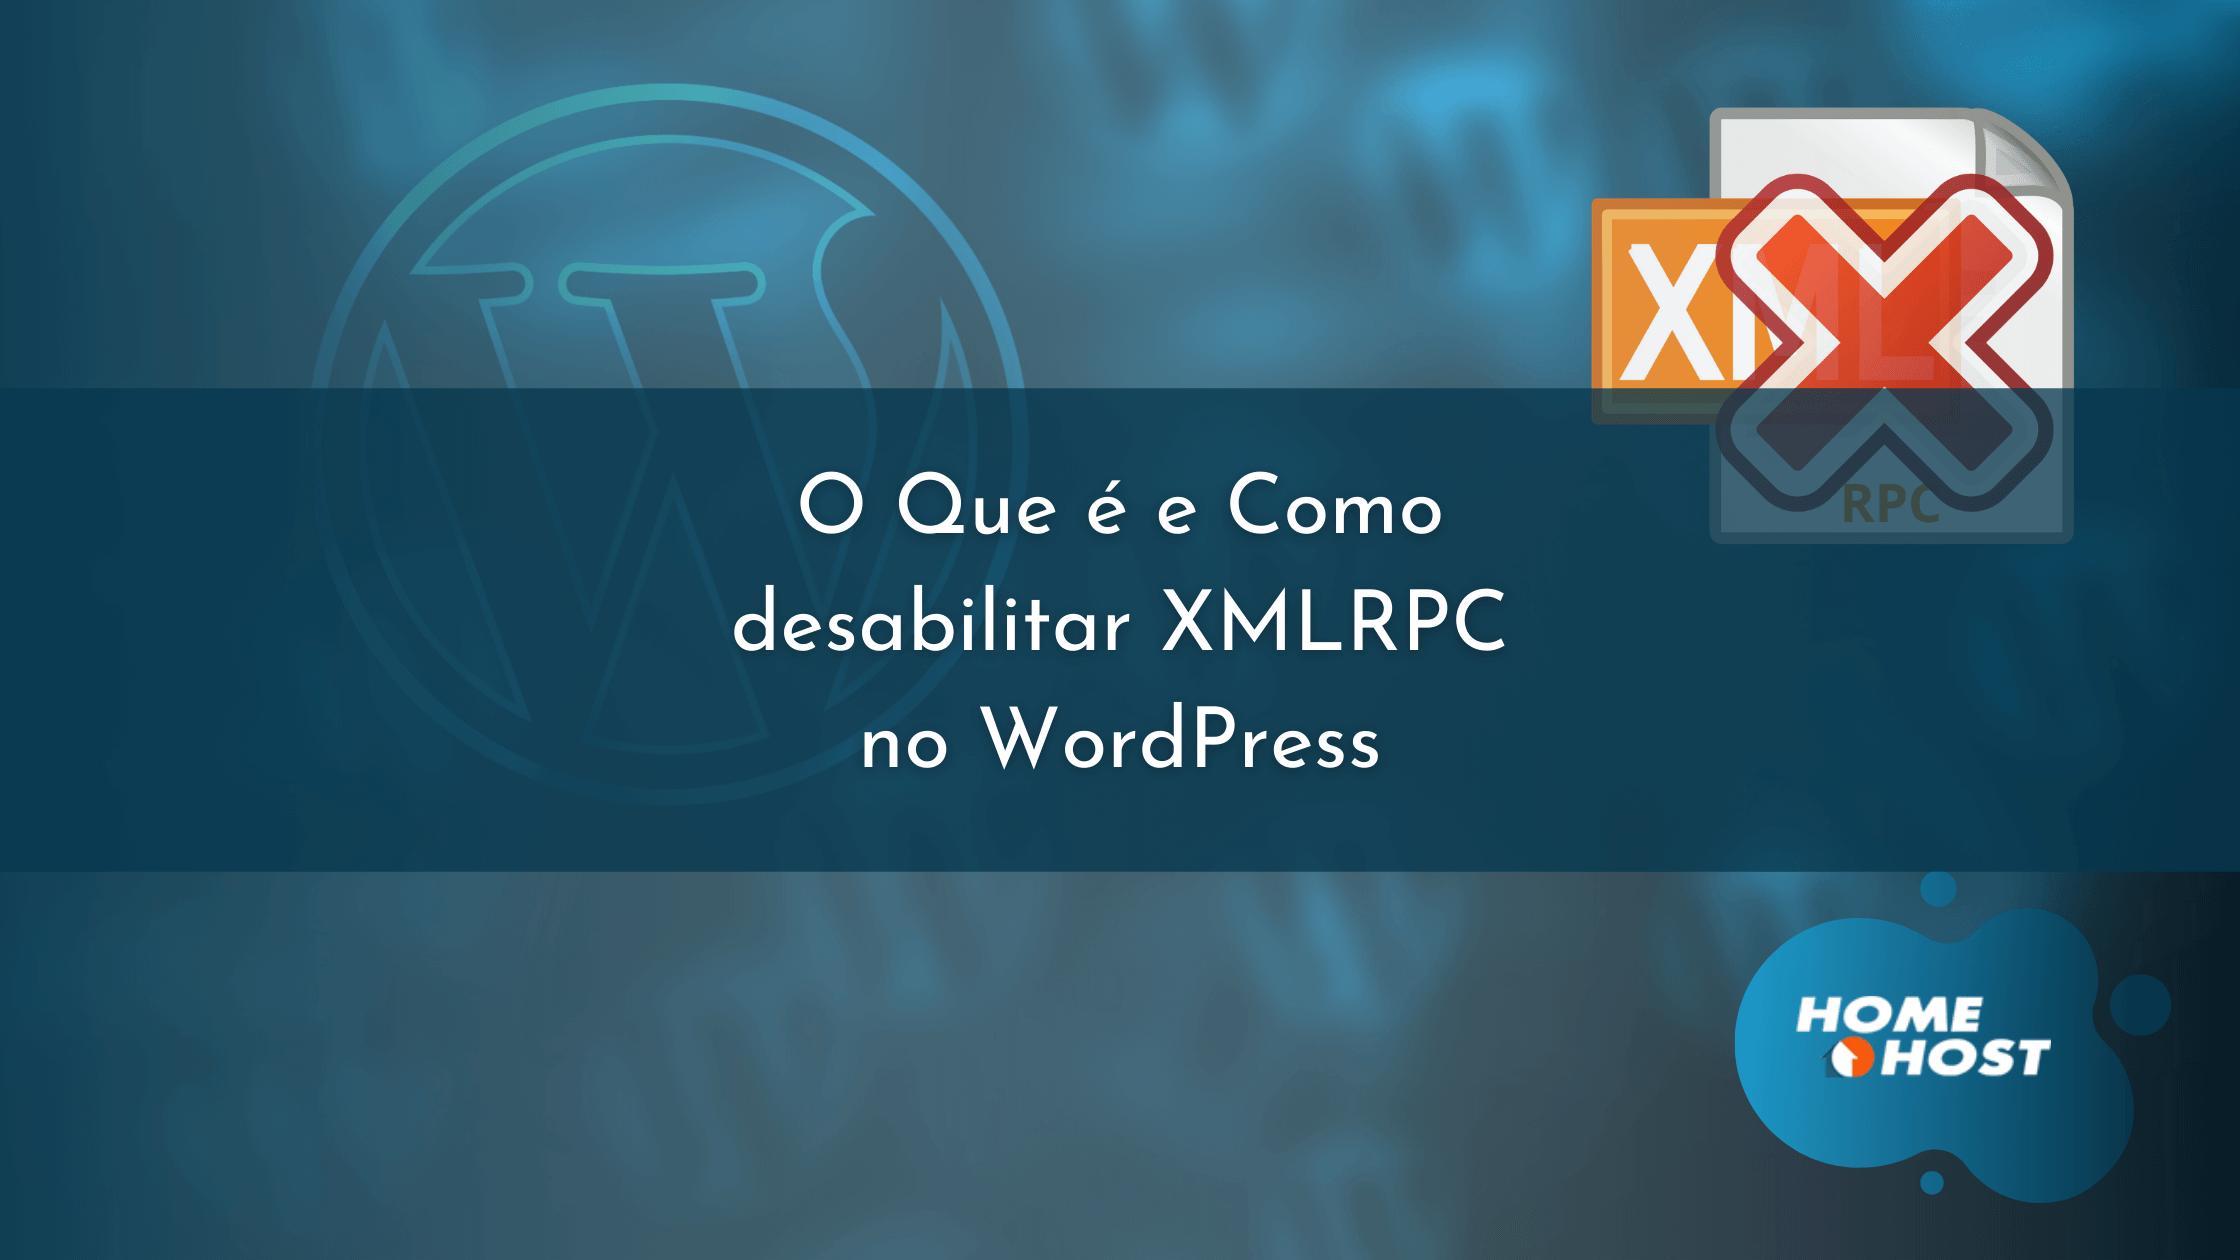 HomeHost - O Que é e Como desabilitar XMLRPC no WordPress